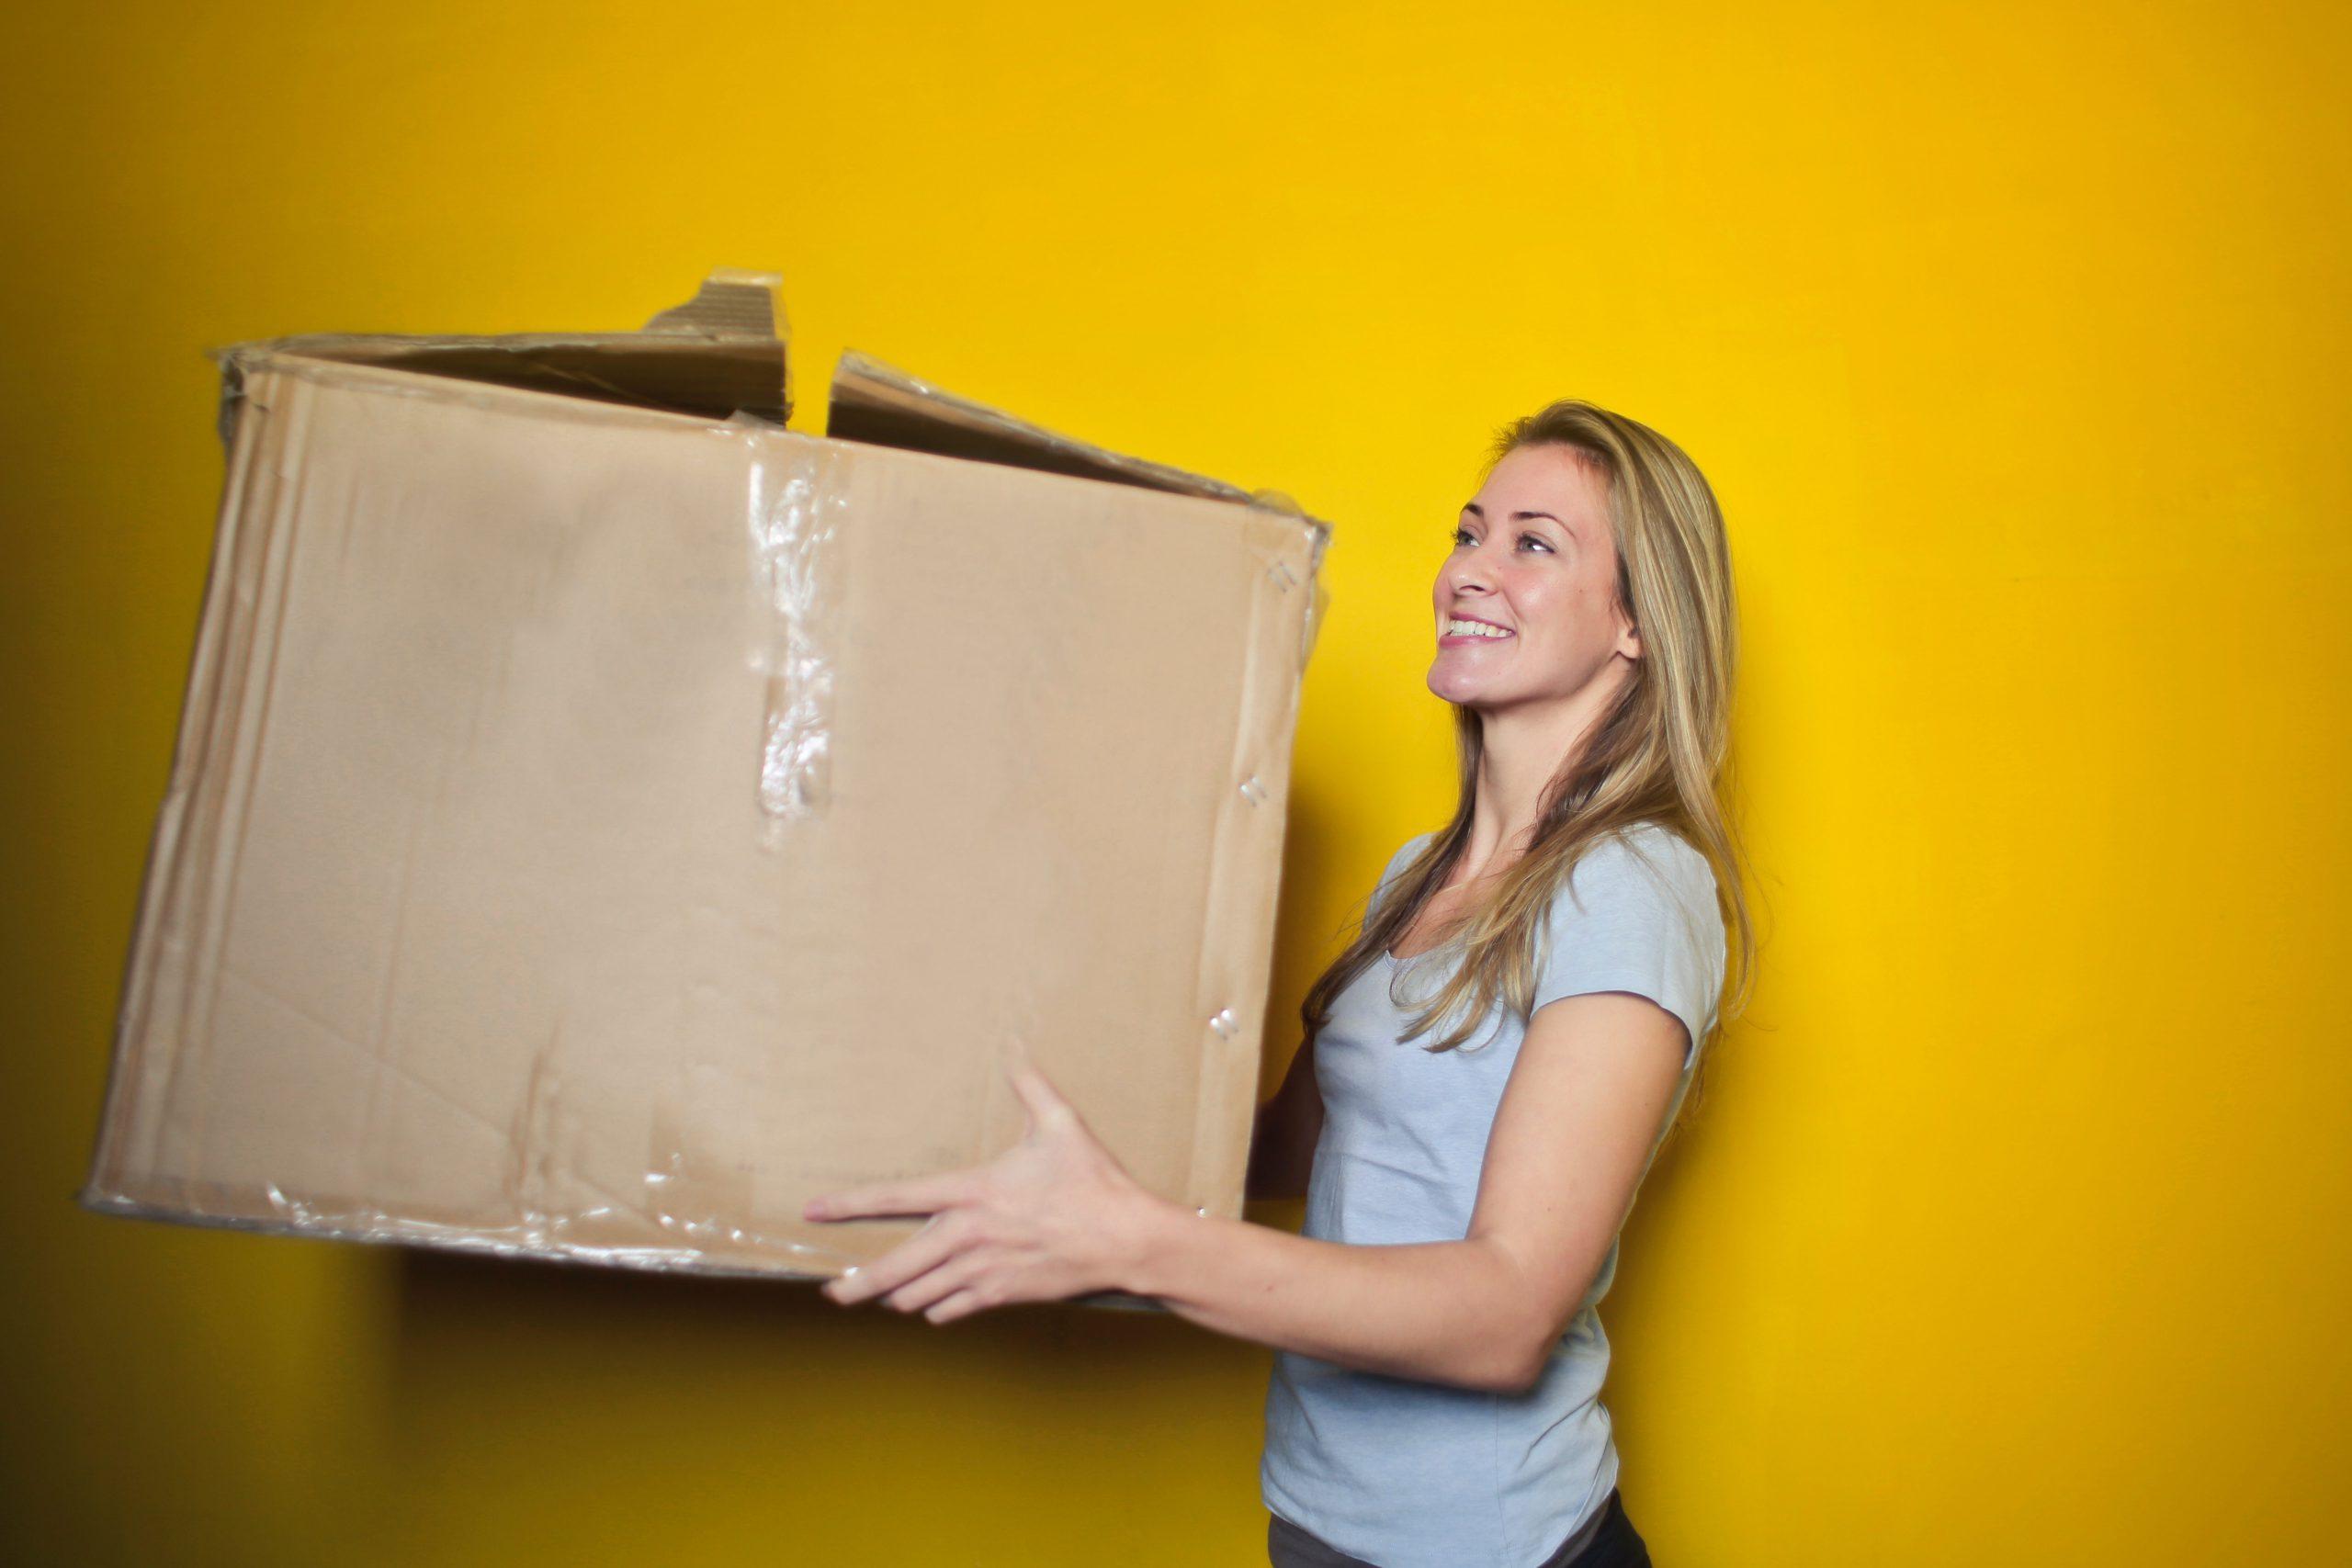 woman-in-grey-shirt-holding-brown-cardboard-box-761999